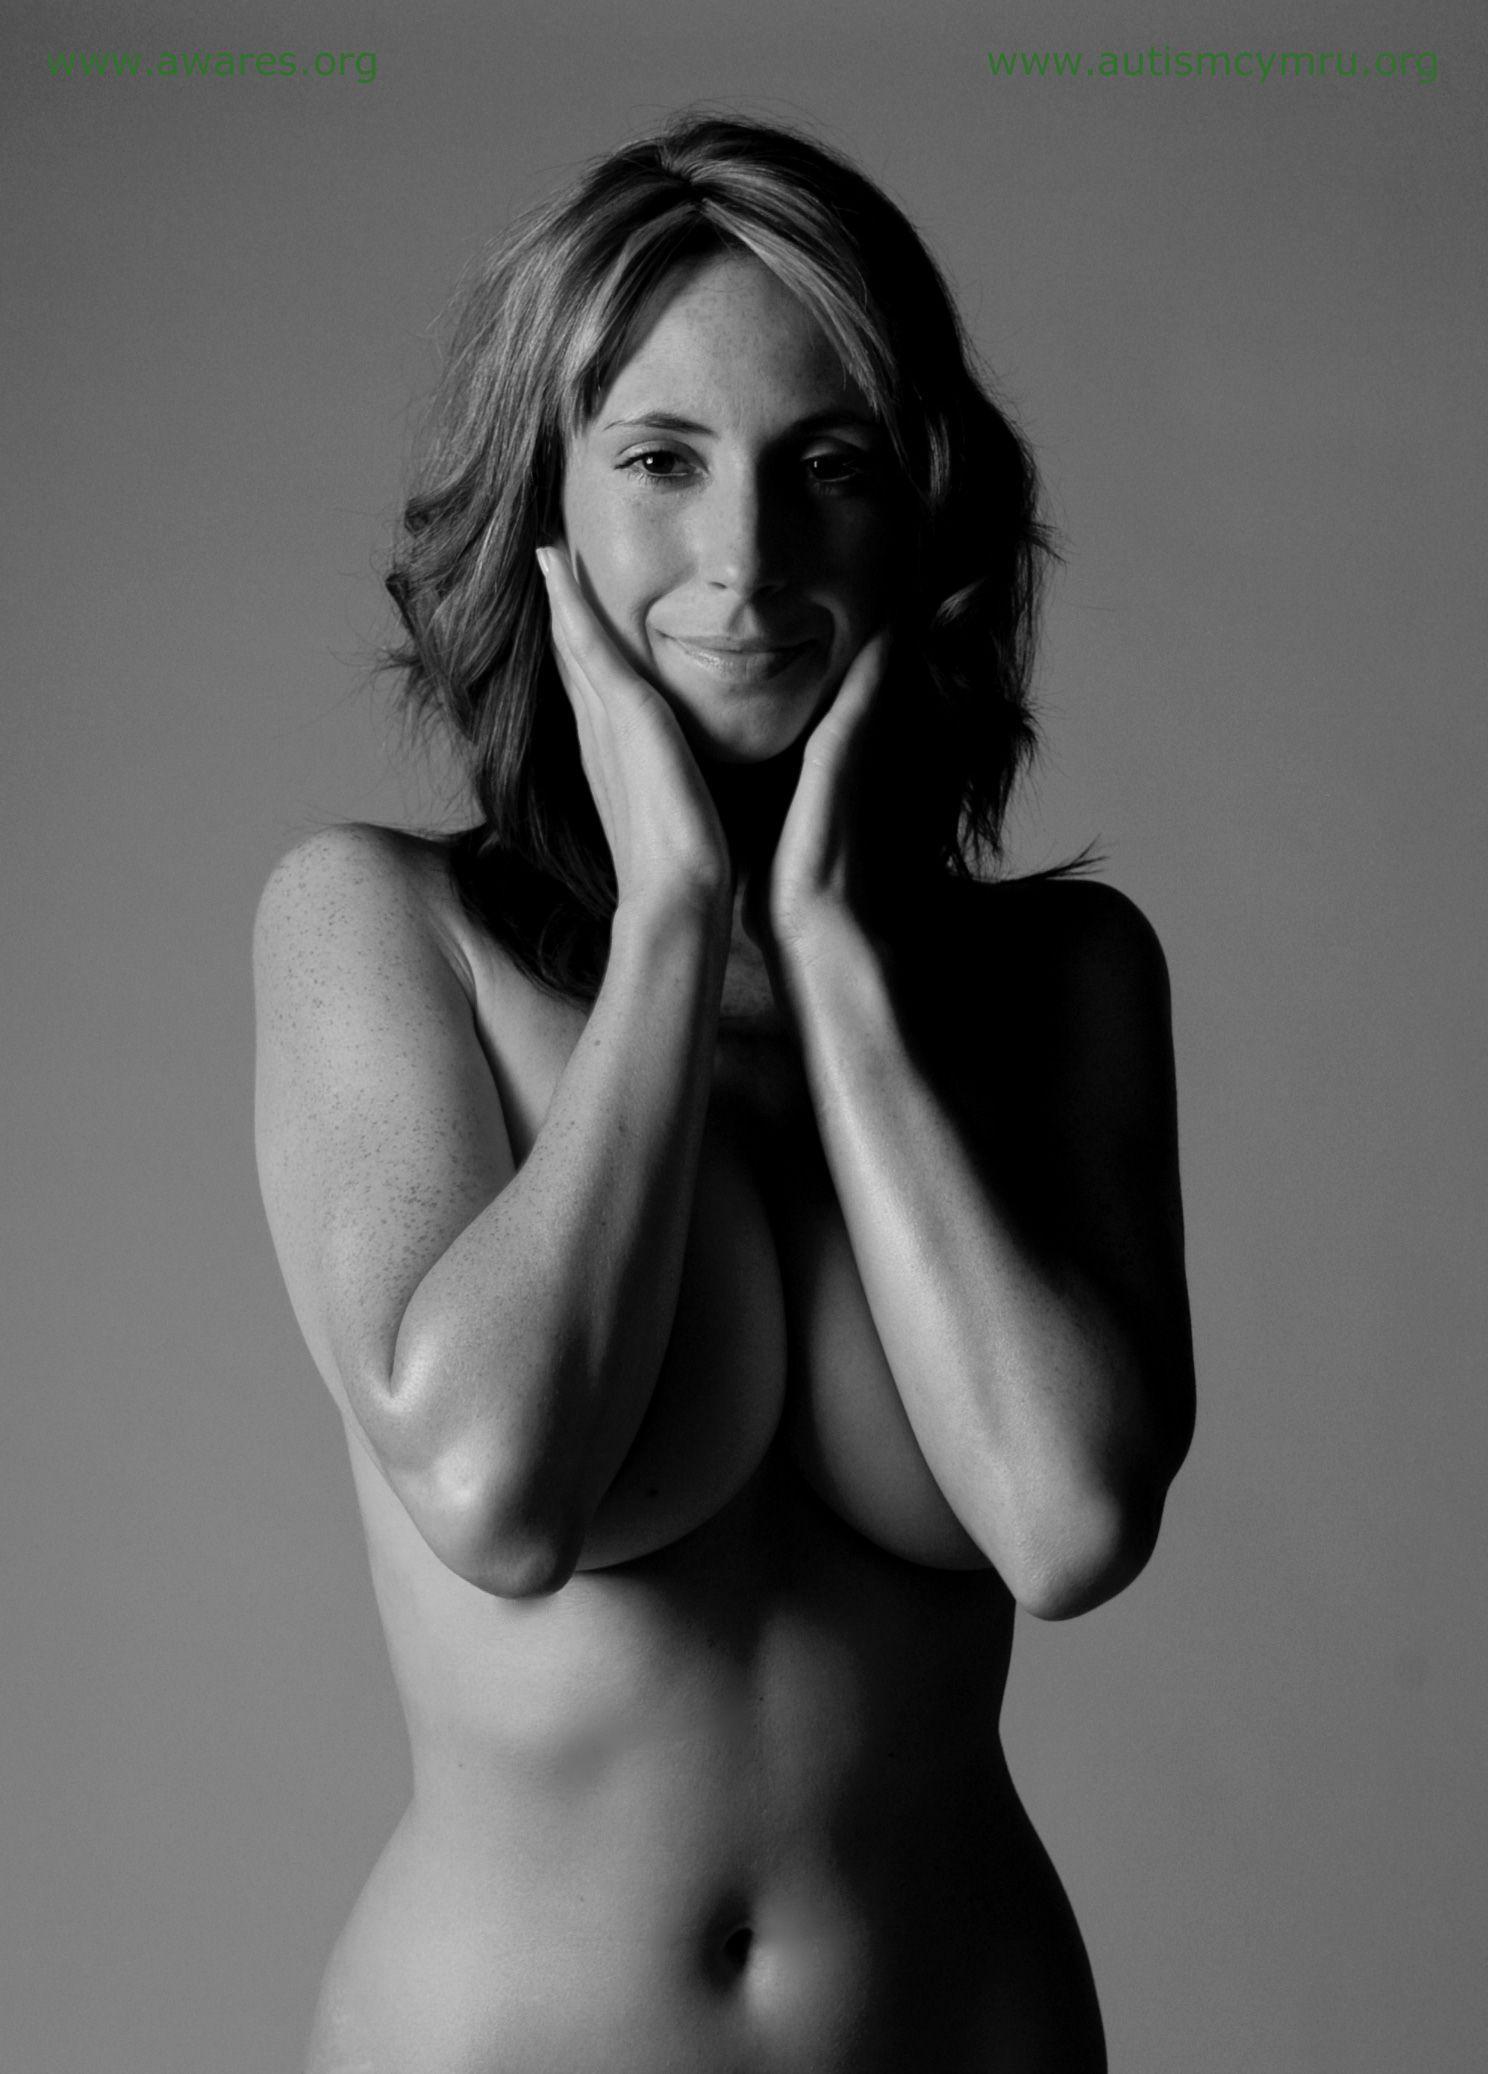 Sweet alex jones one show topless jolie